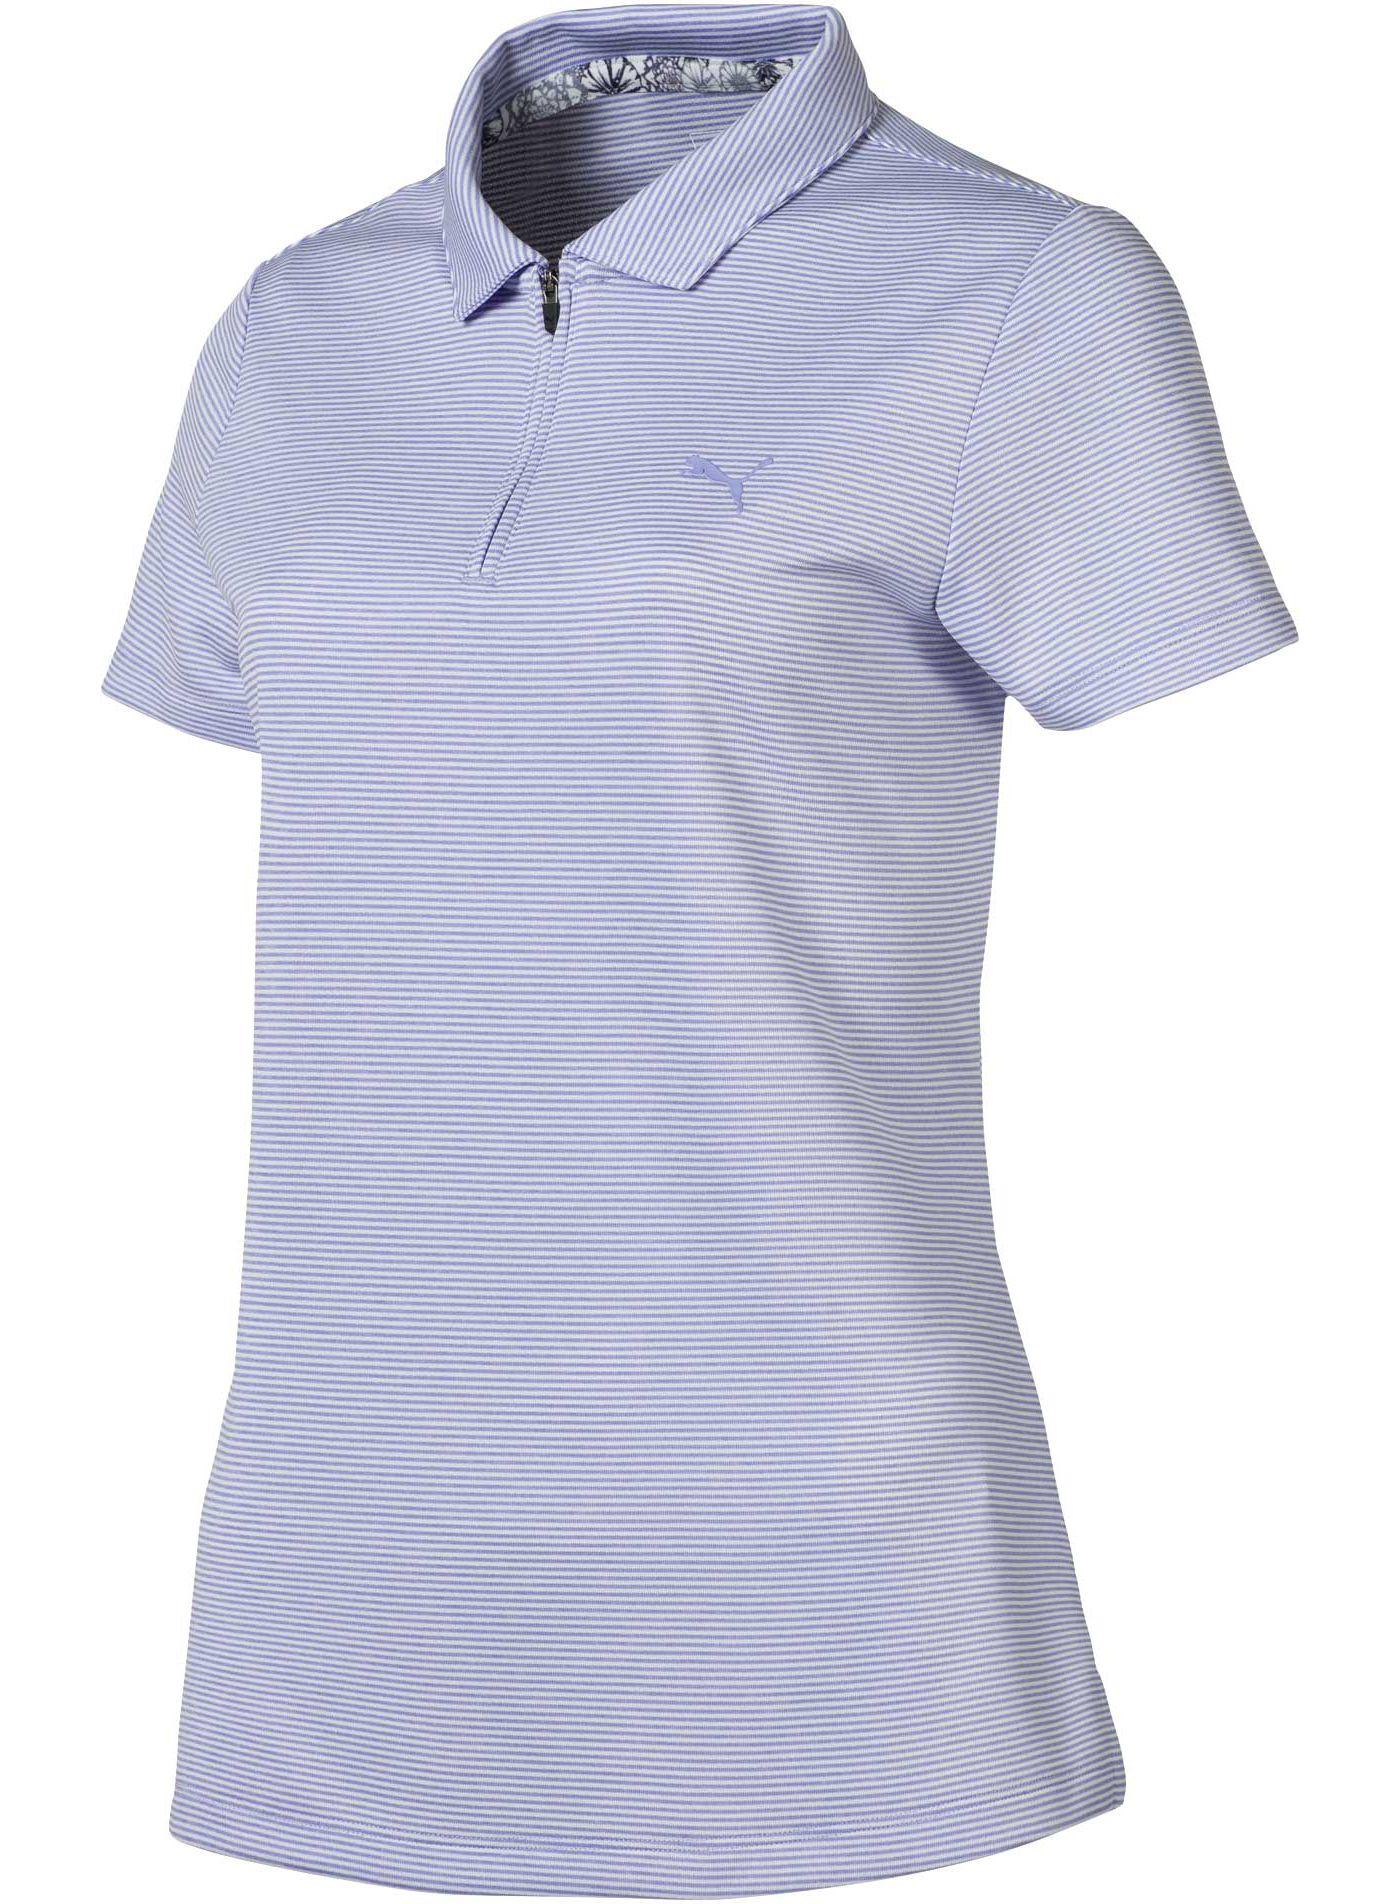 PUMA Women's Soft Stripe Golf Polo